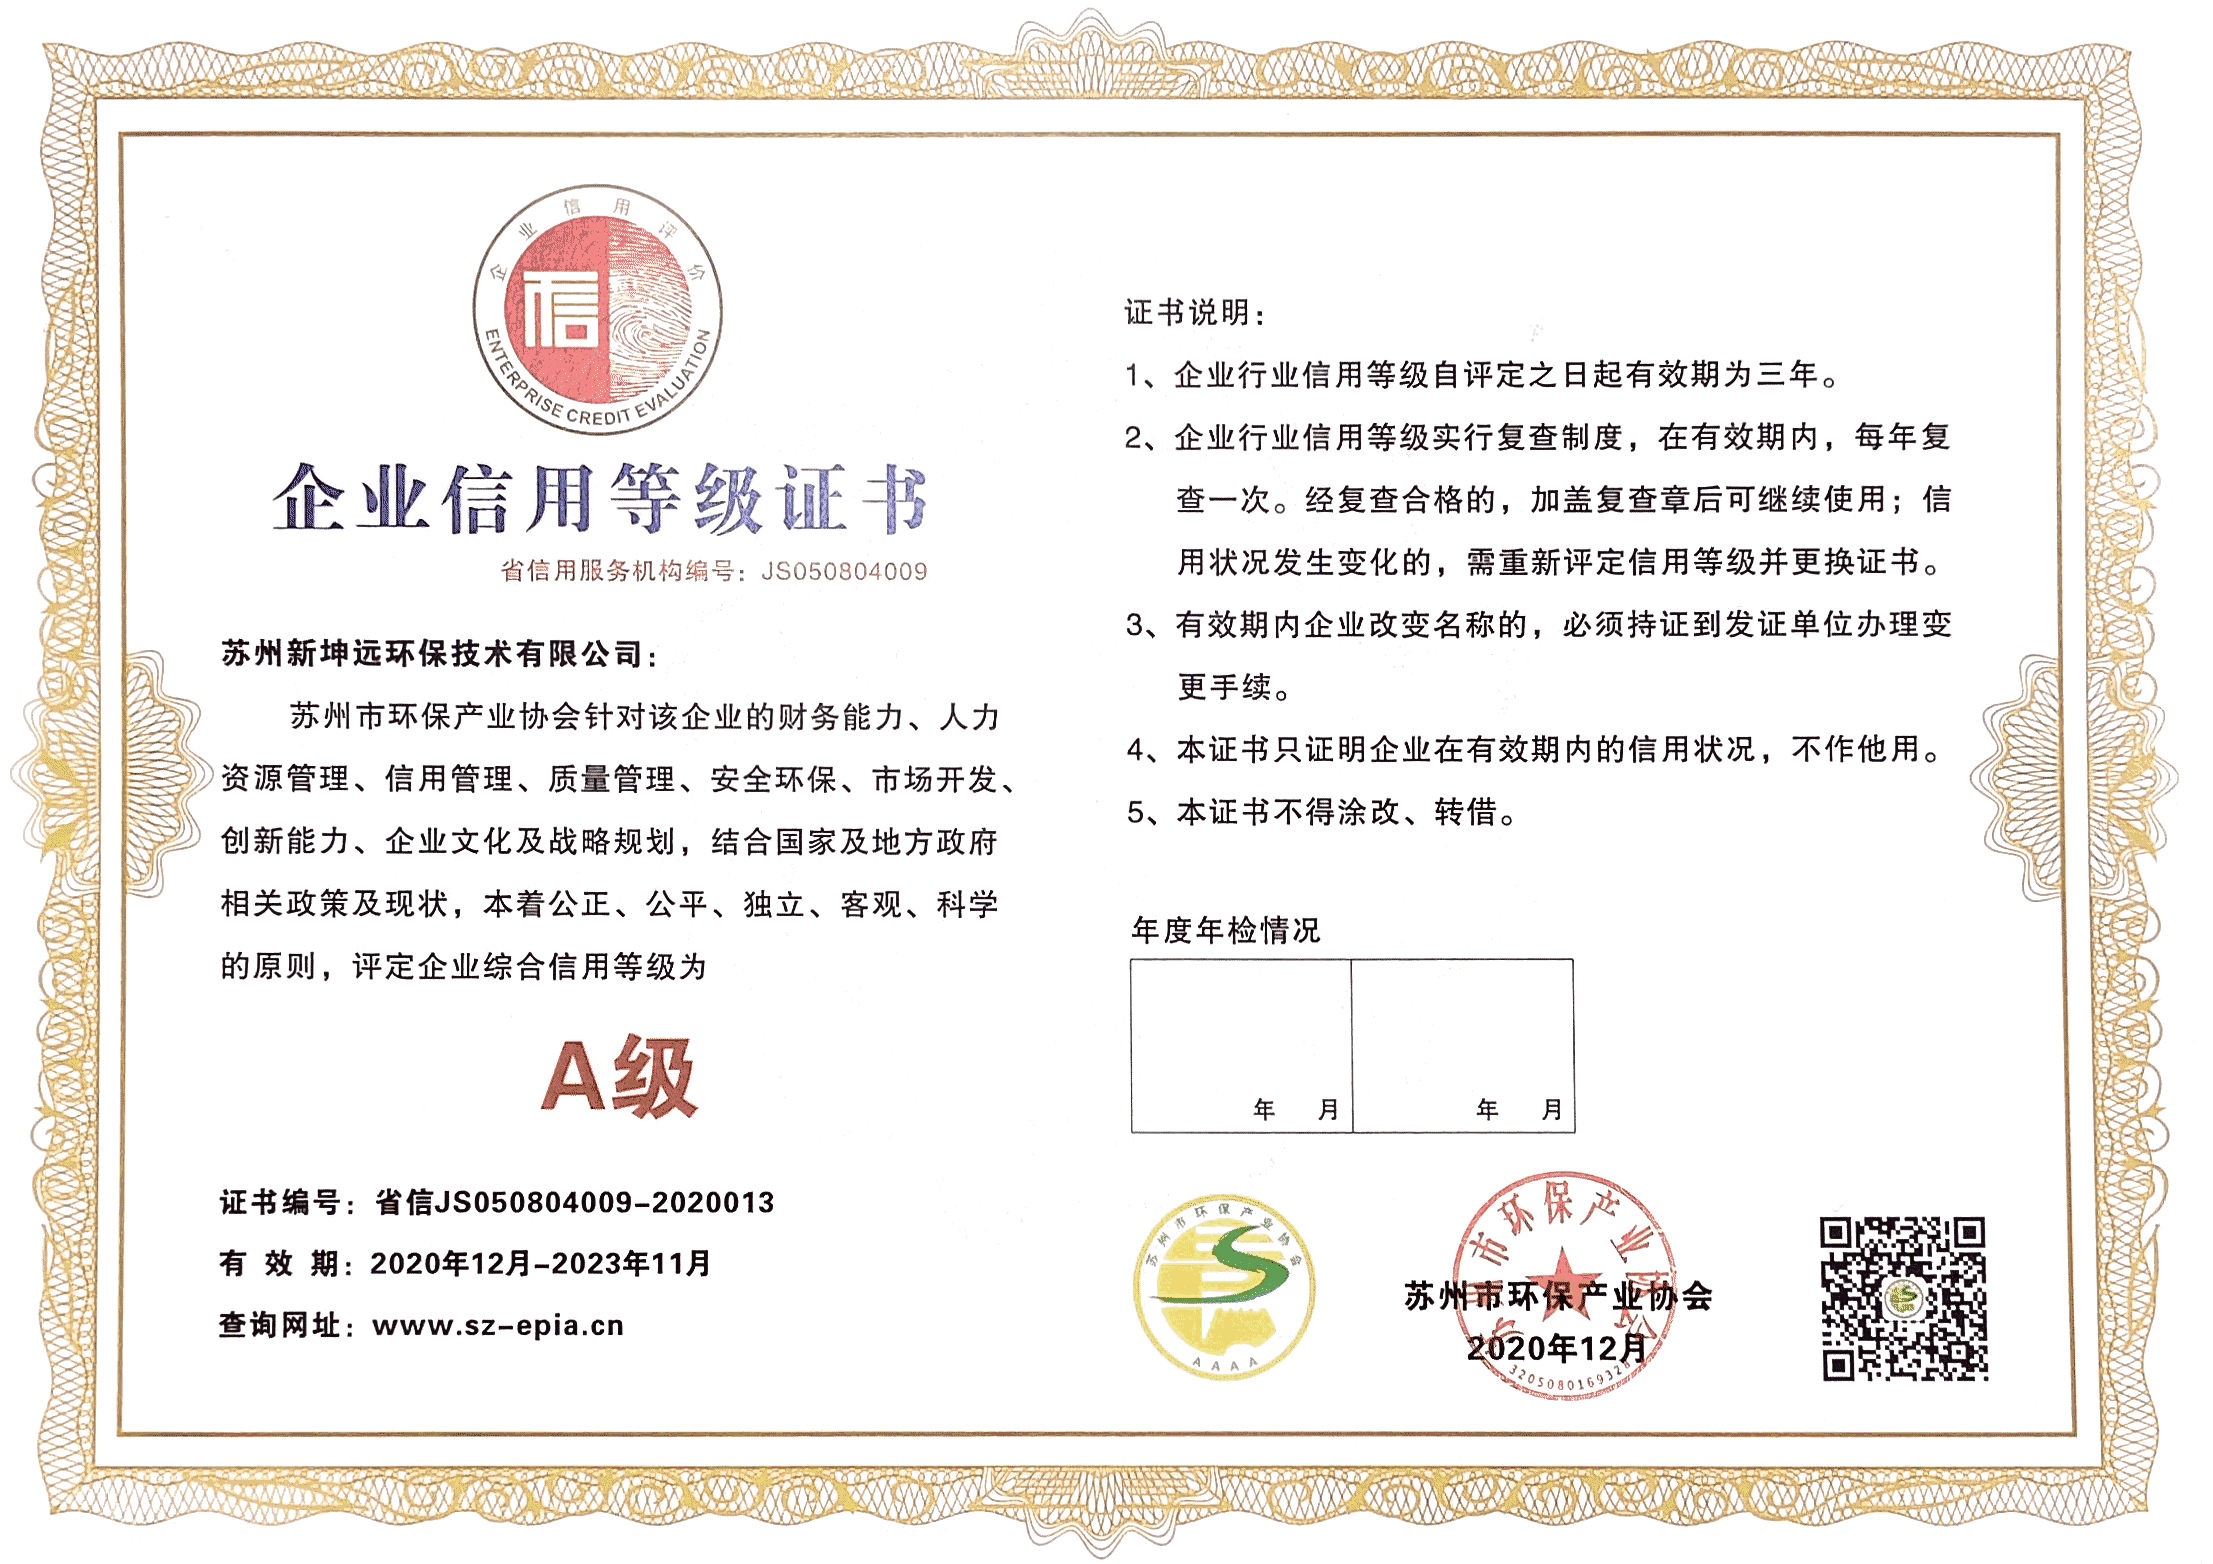 NGE-热博rb88体育app下载企业信用等级证书